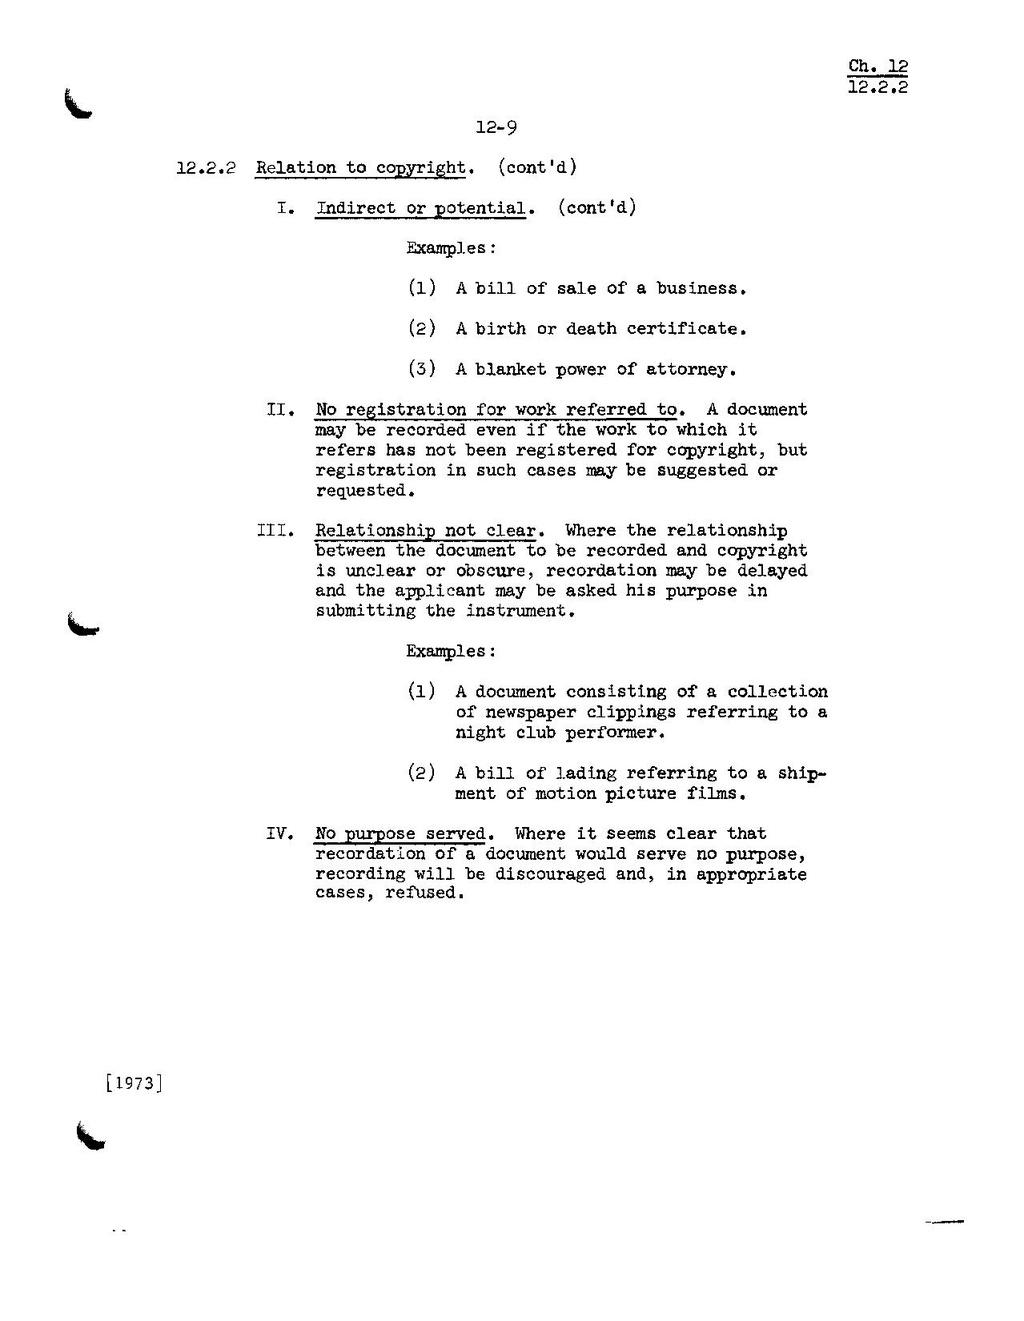 Death certificate wikipedia school invoice template 1973pdf299 page299 1024px compendium of us copyright office practices 28197329 299 death certificate wikipedia death certificate wikipedia aiddatafo Images